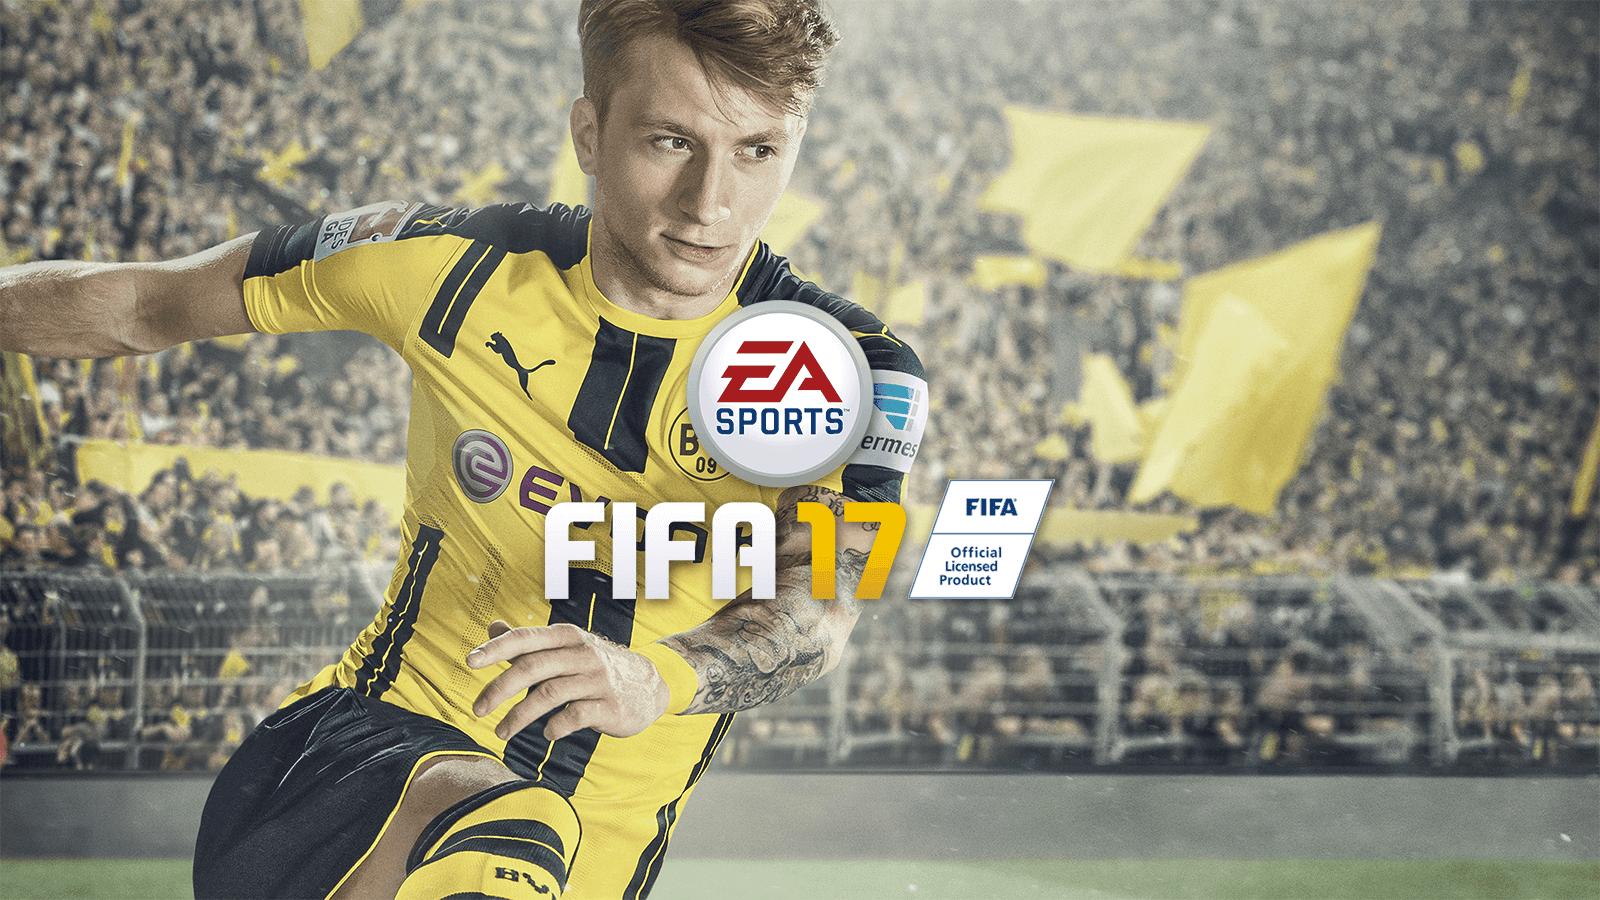 fifa 2017 FIFA 17 Oyun İnceleme